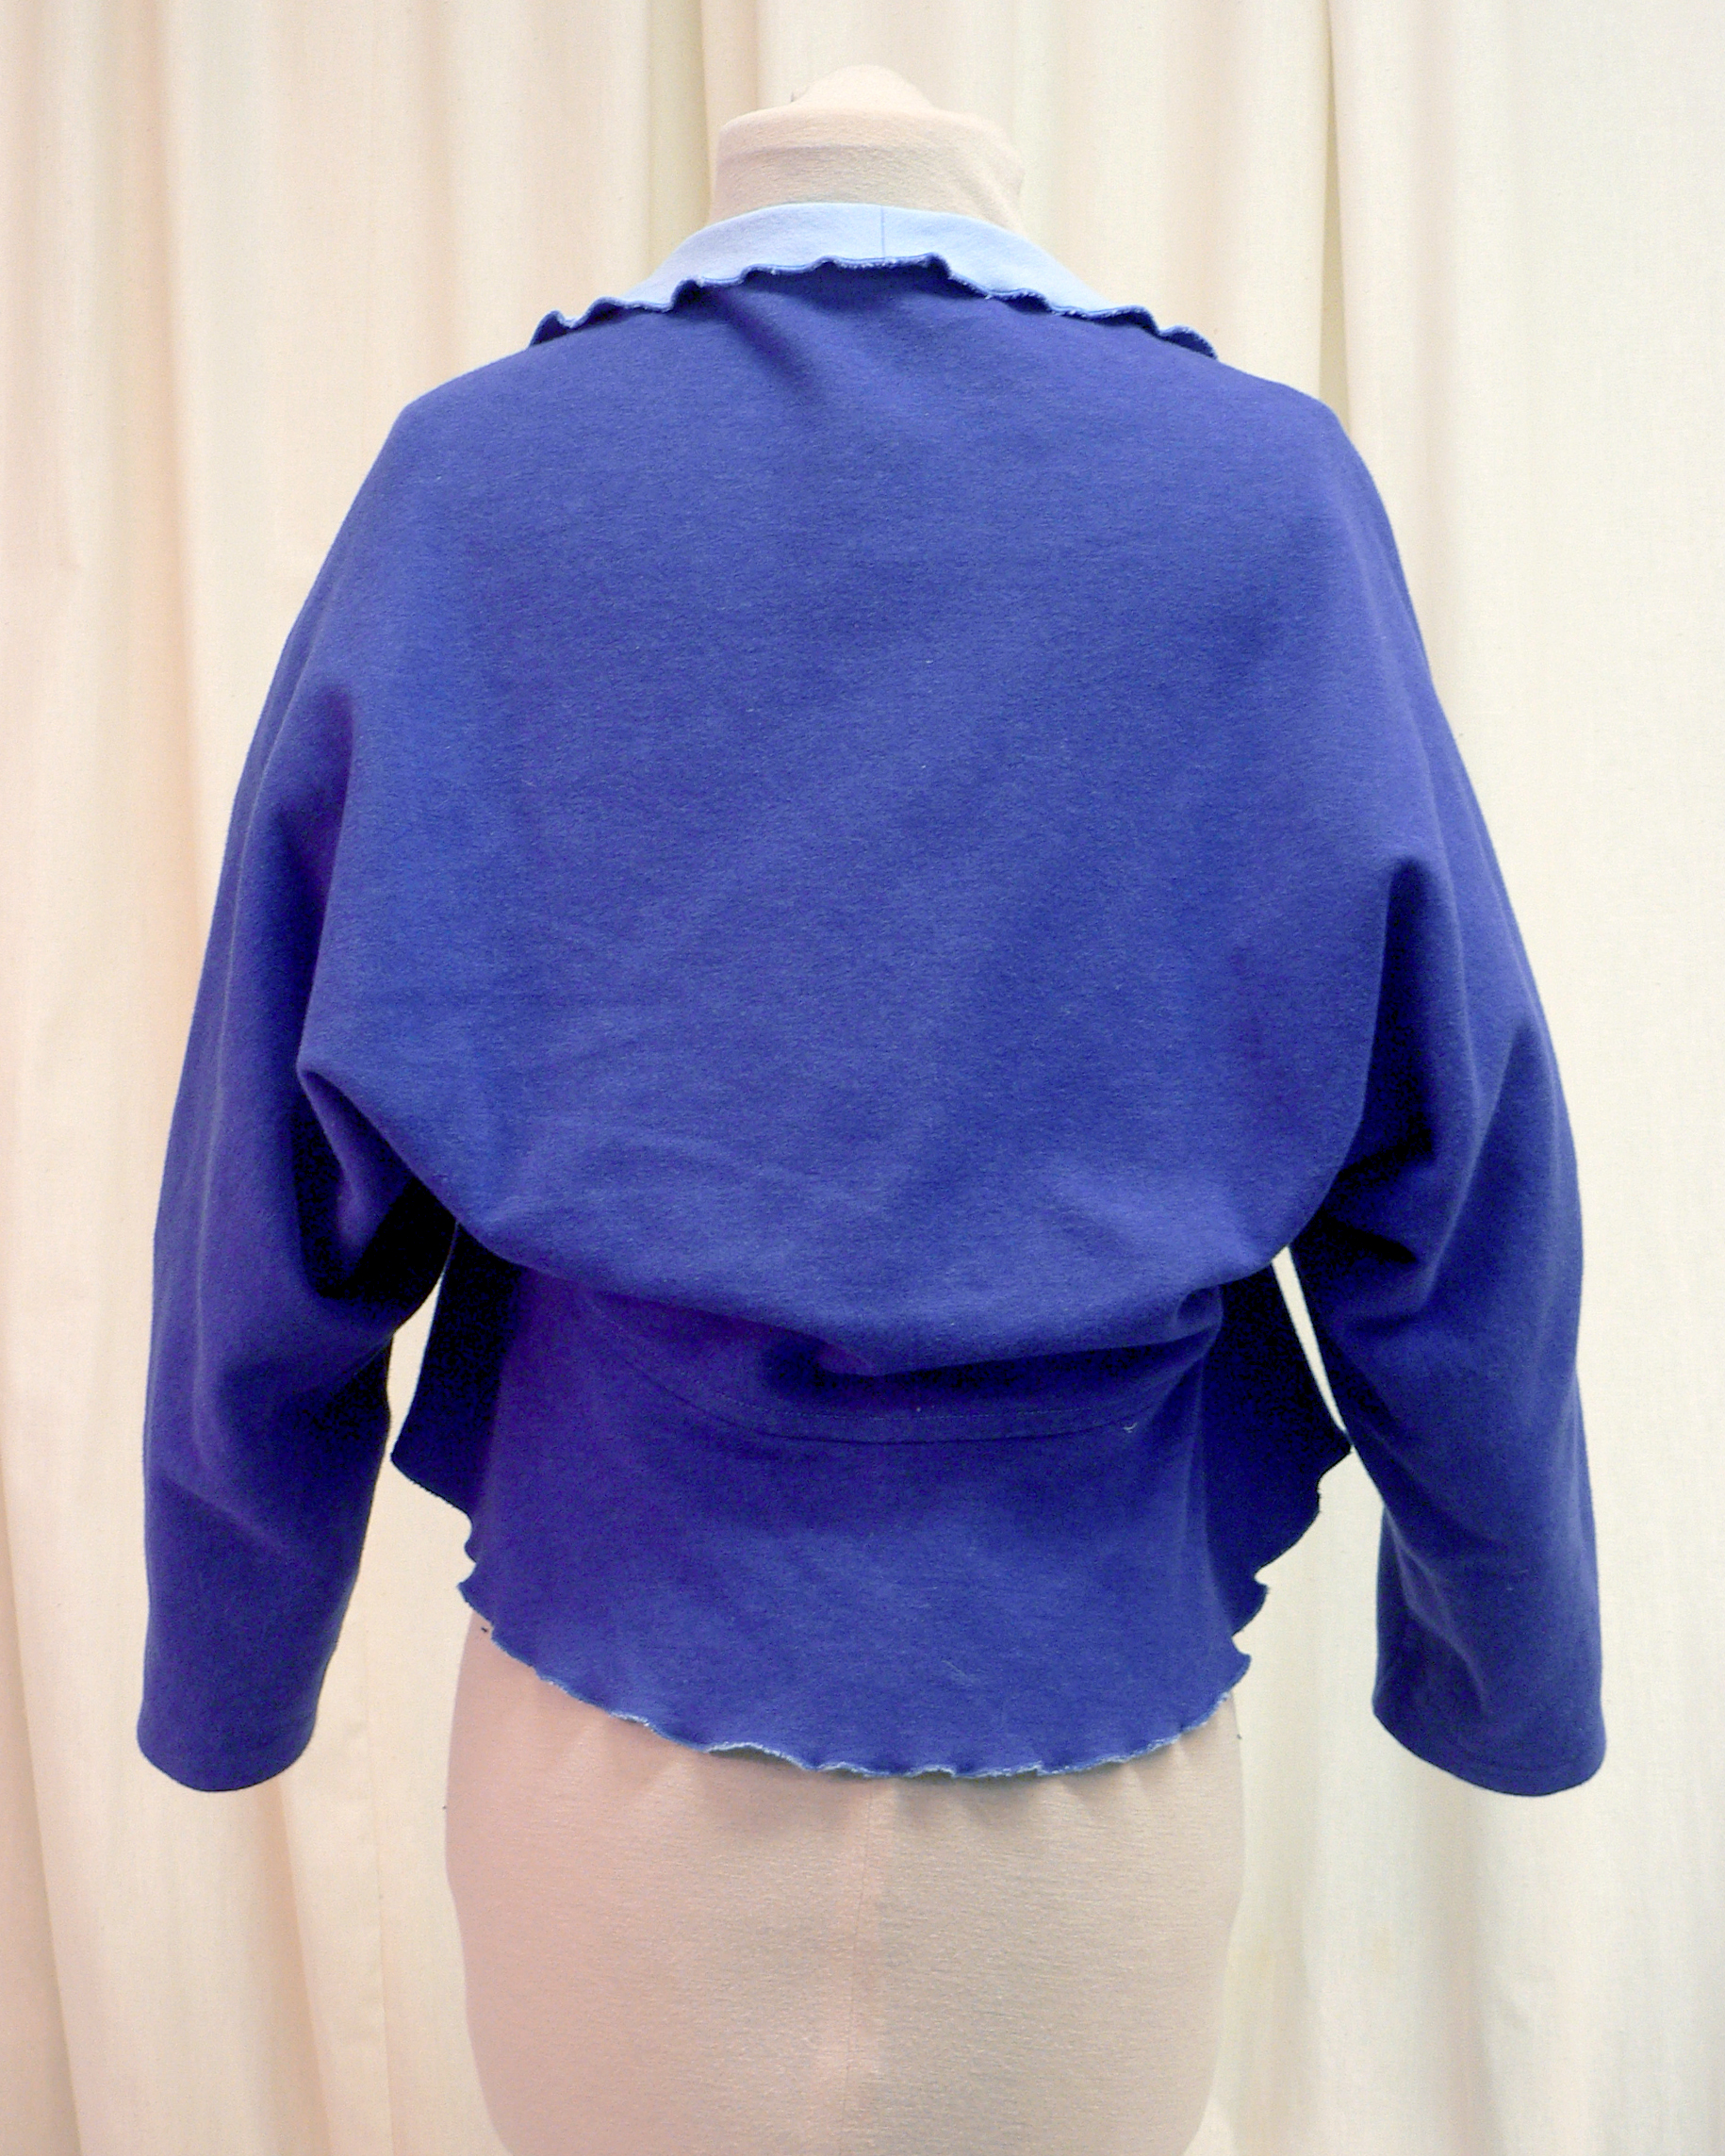 jacket22_back.jpg